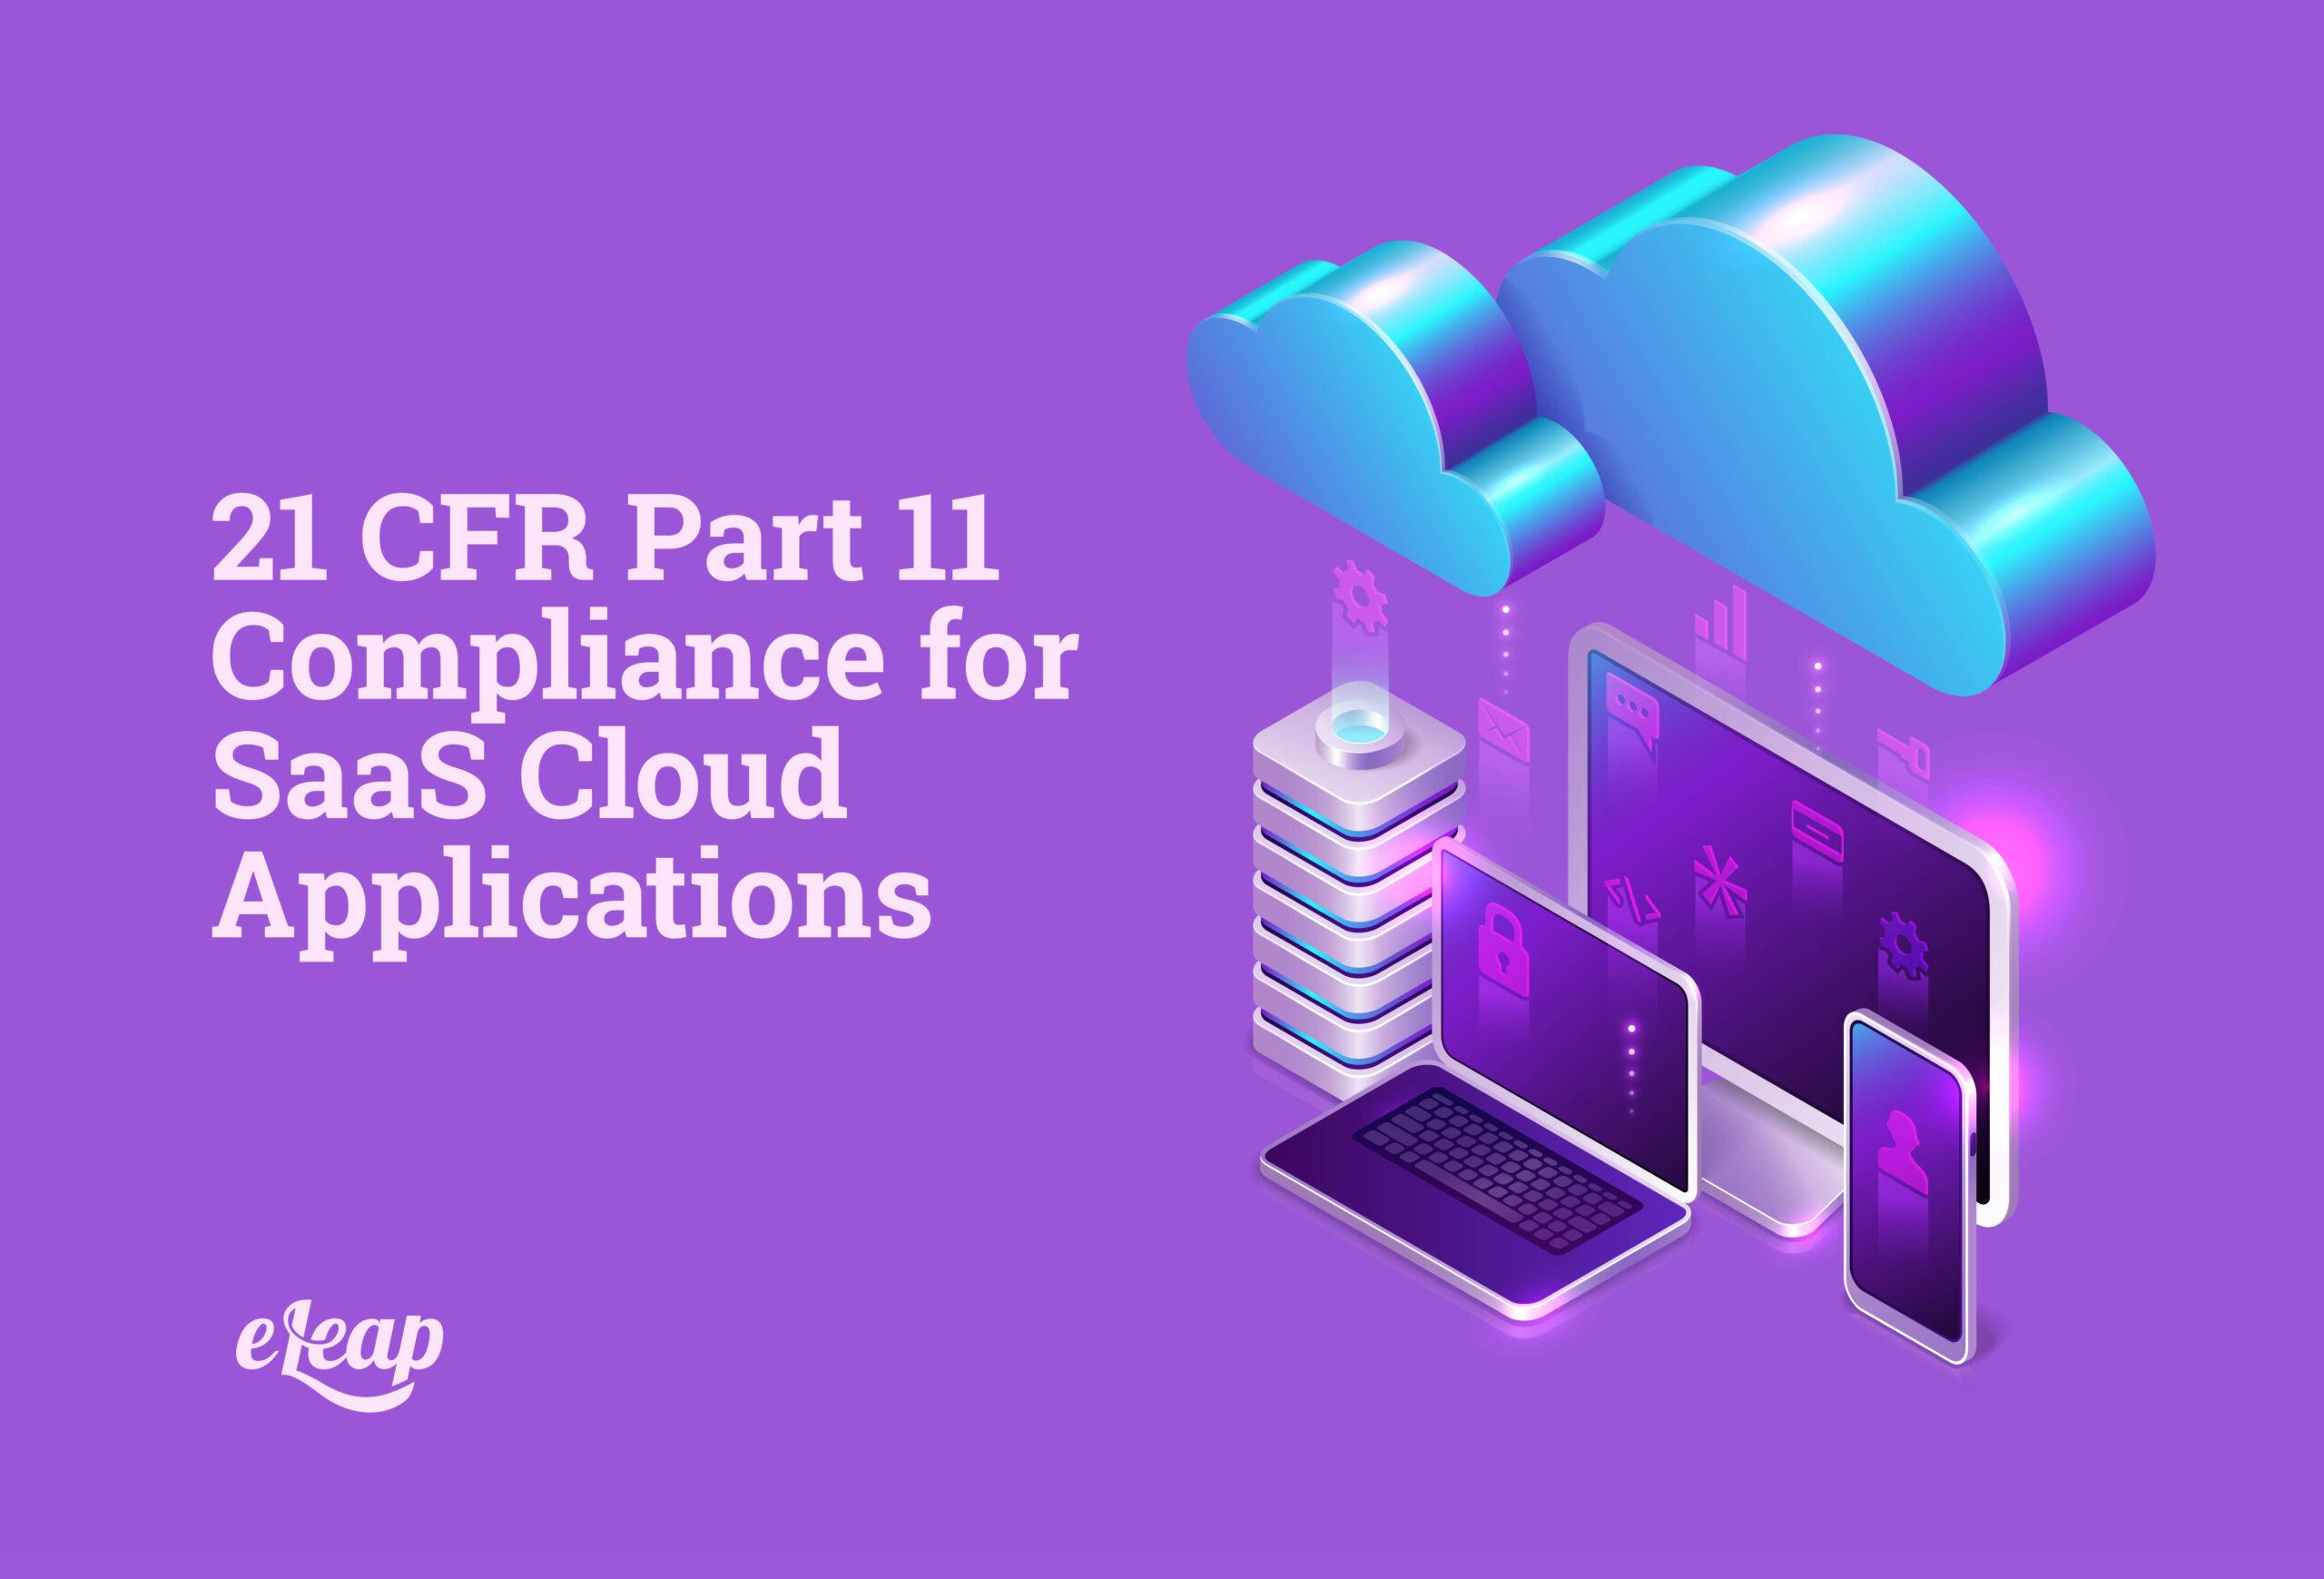 21 CFR Part 11 Compliance for SaaS Cloud Applications